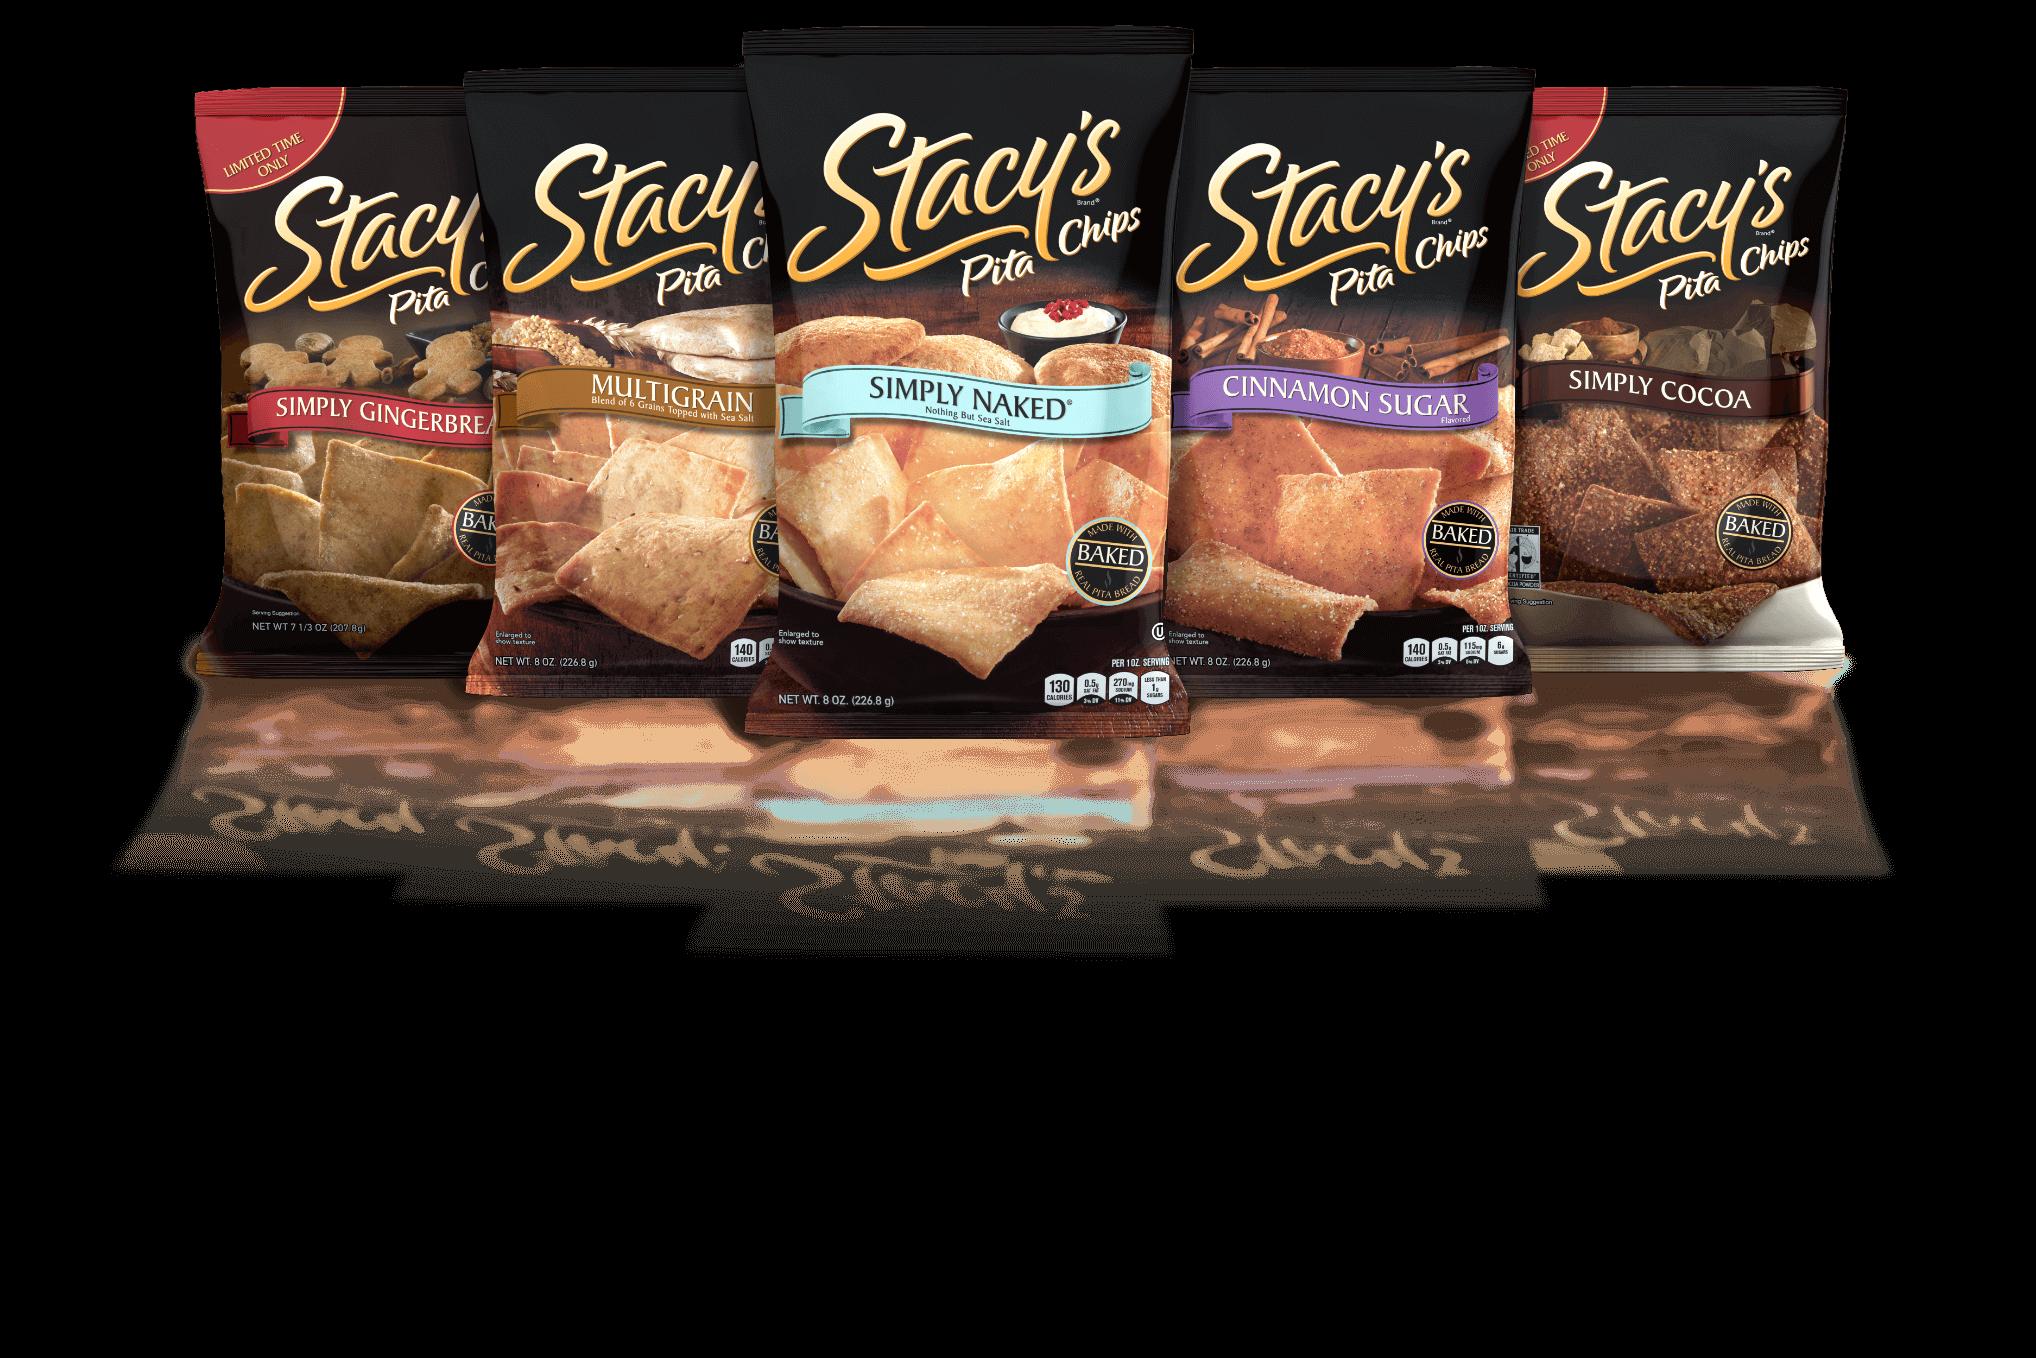 Stacy's Pita Chips bag line ups